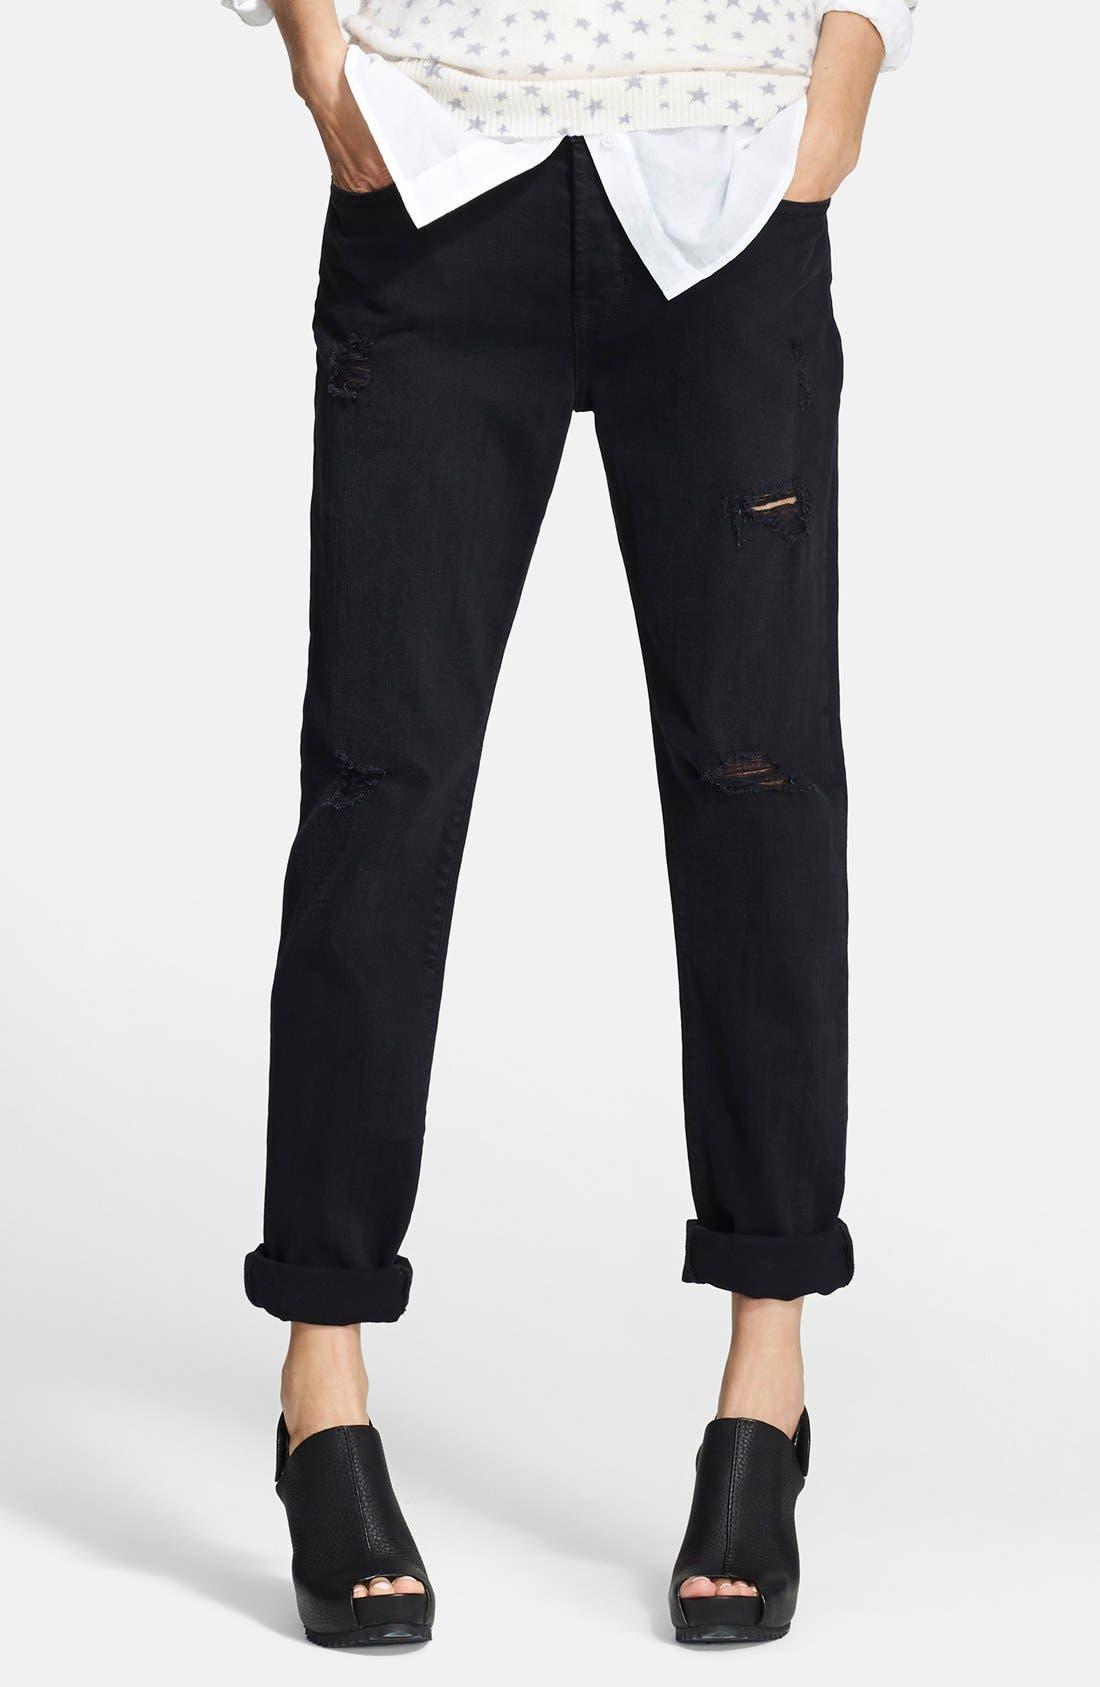 Alternate Image 1 Selected - Current/Elliott 'The Traveler' Boyfriend Jeans (Black Destroy)